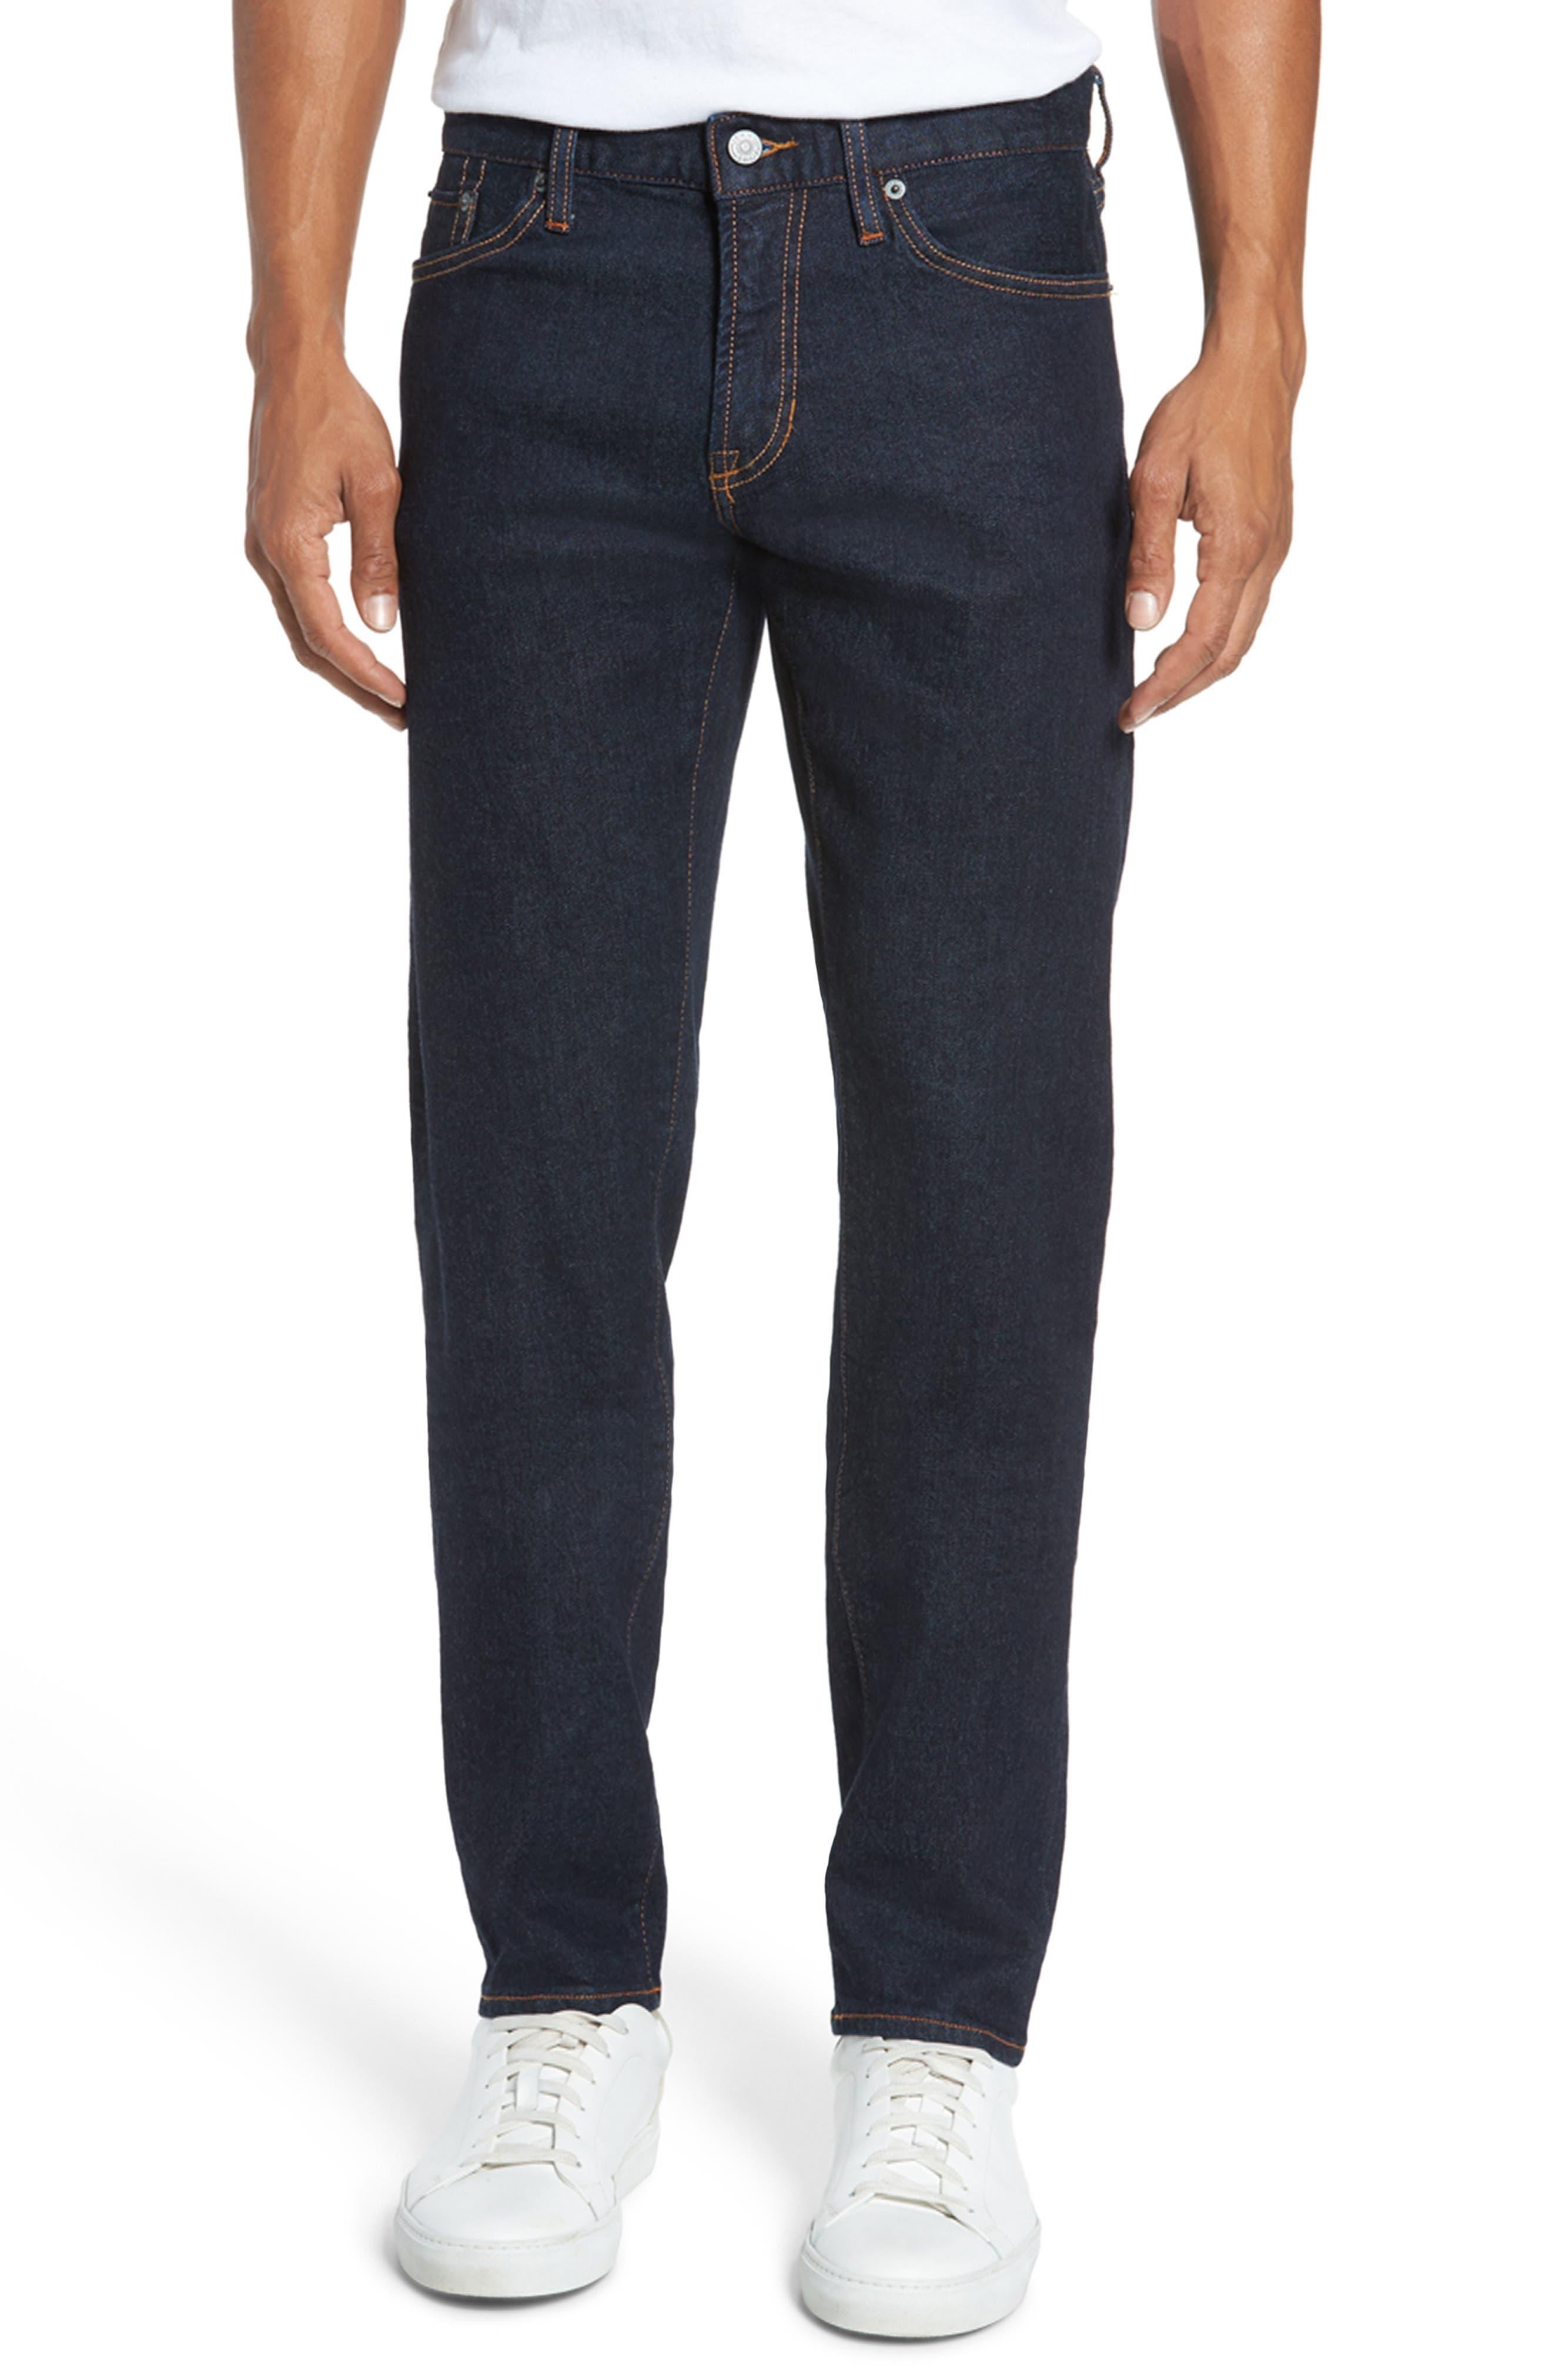 Alternate Image 1 Selected - Jean Shop Jim Slim Fit Selvedge Jeans (Stretch Rinse)